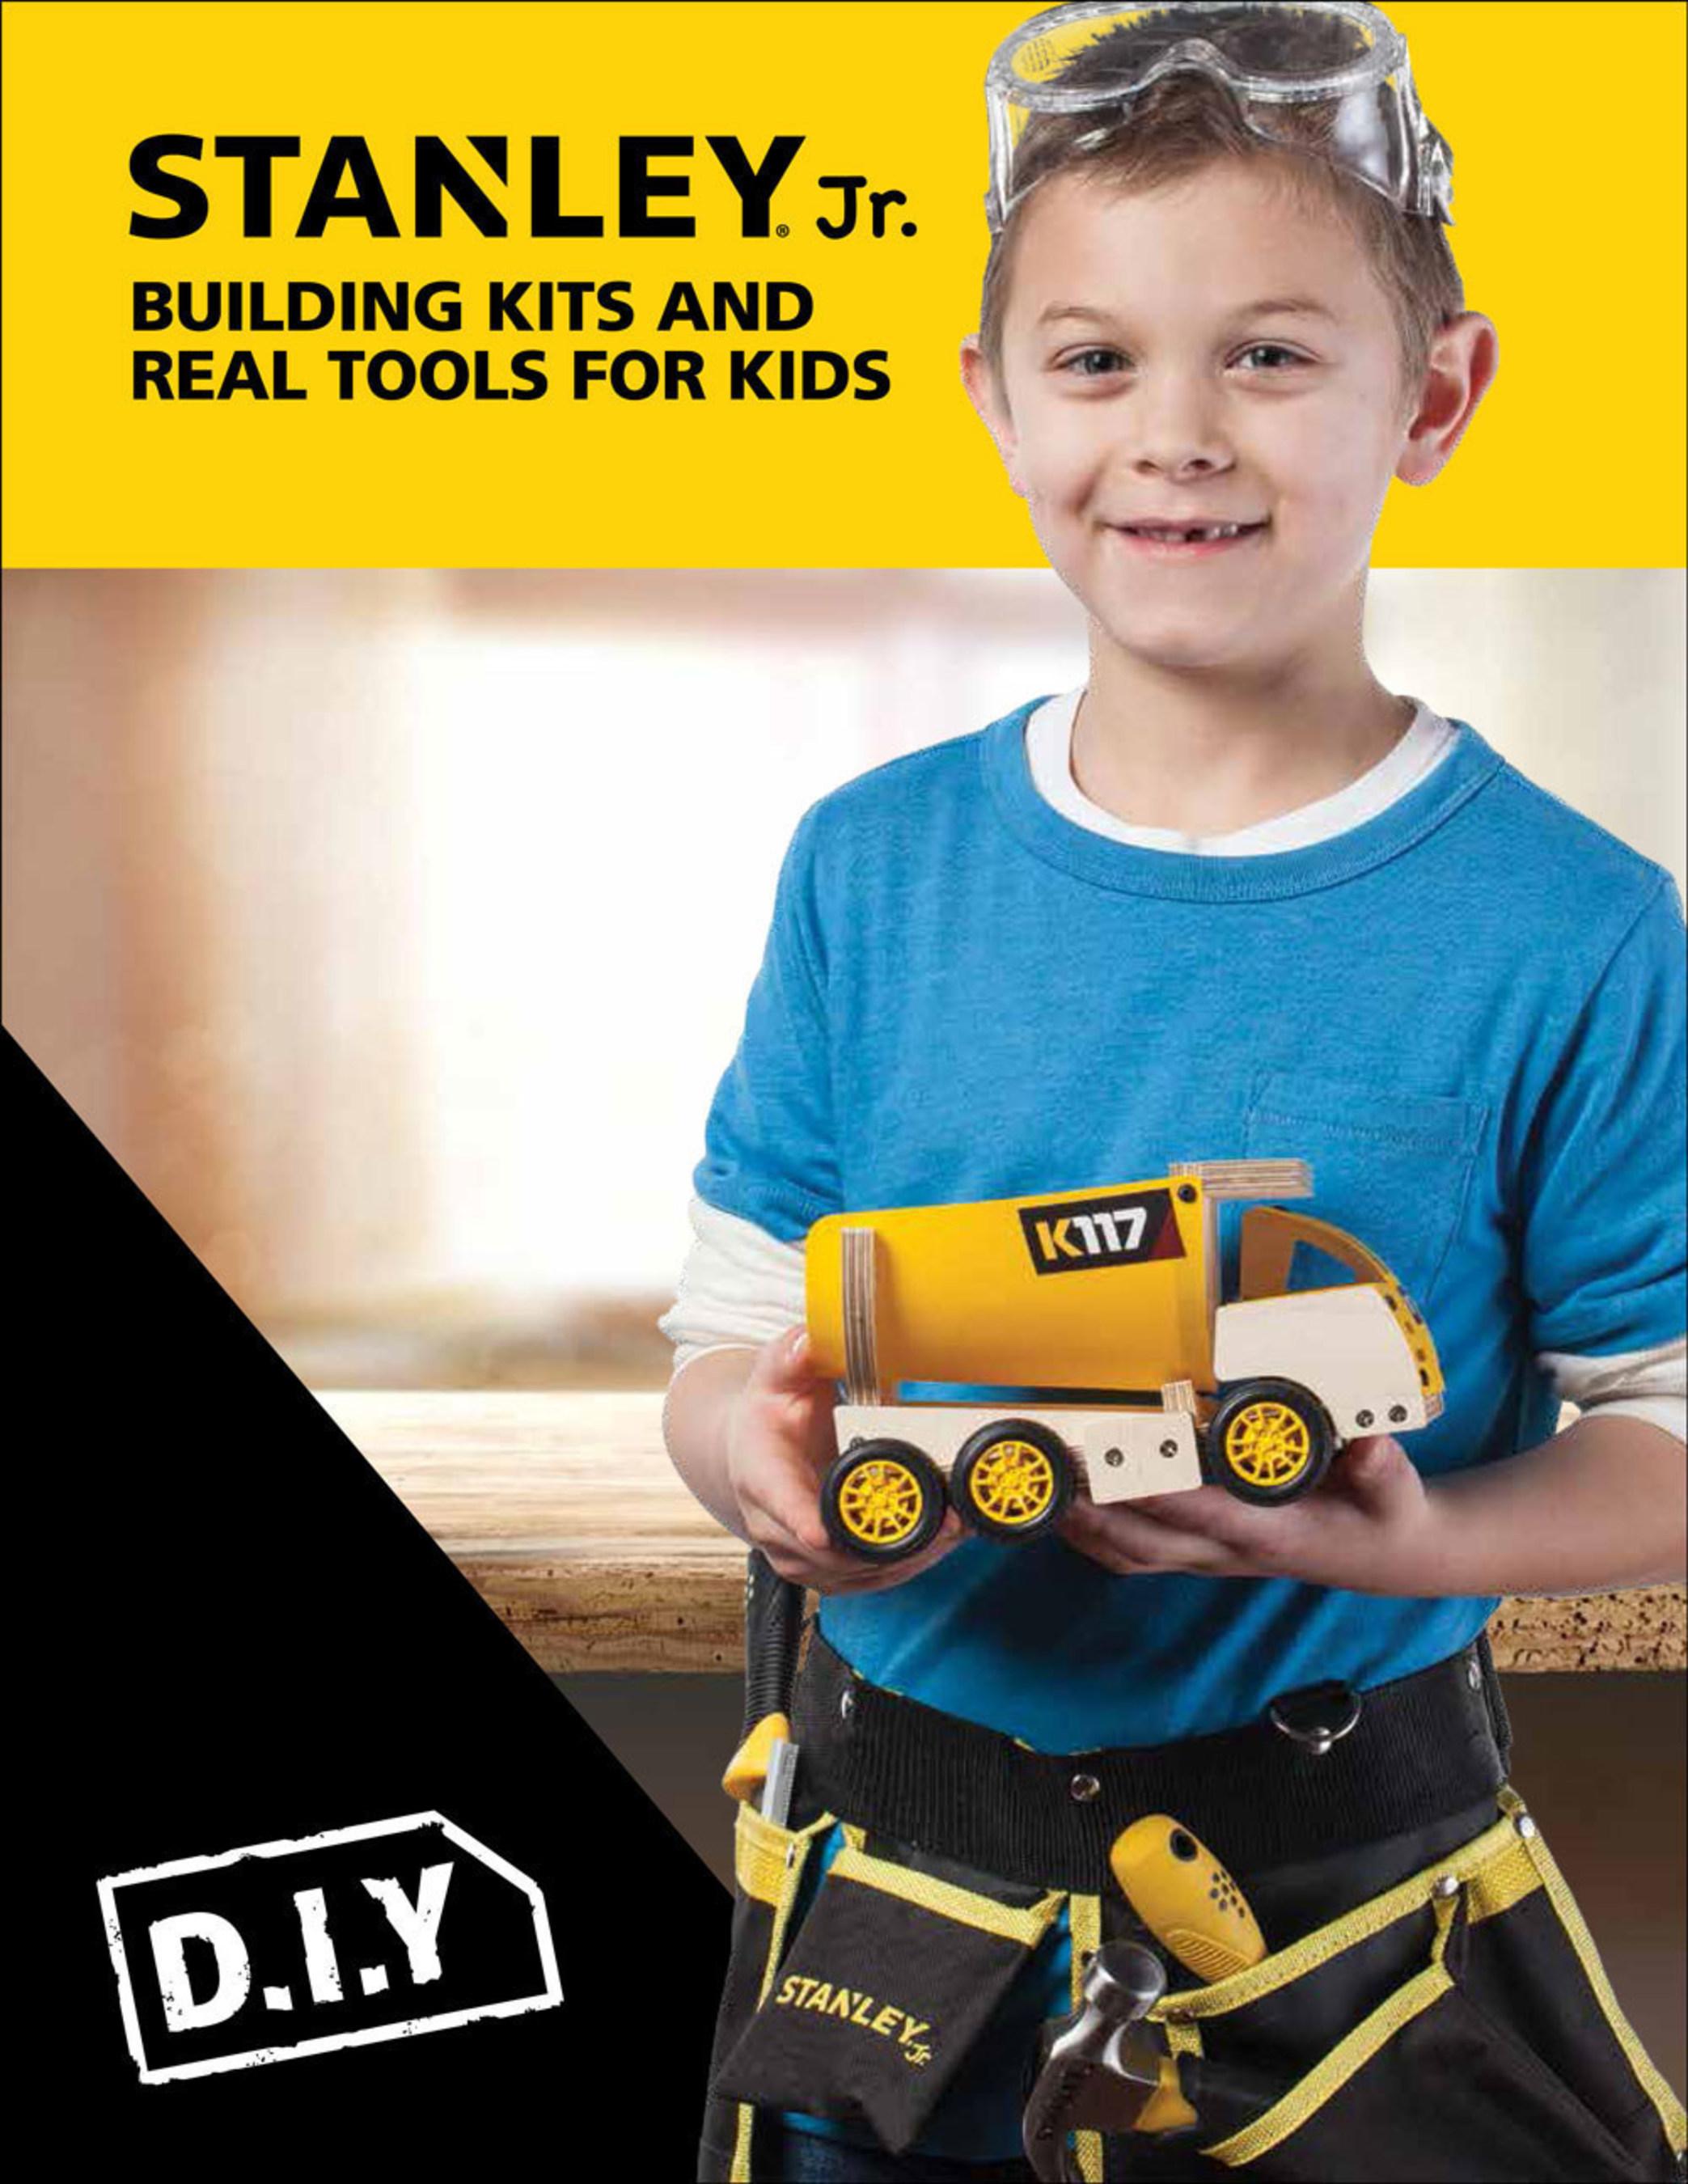 Reeves International Introduces STANLEY® Jr.  DIY Wood Craft & Tool Sets for Kids!